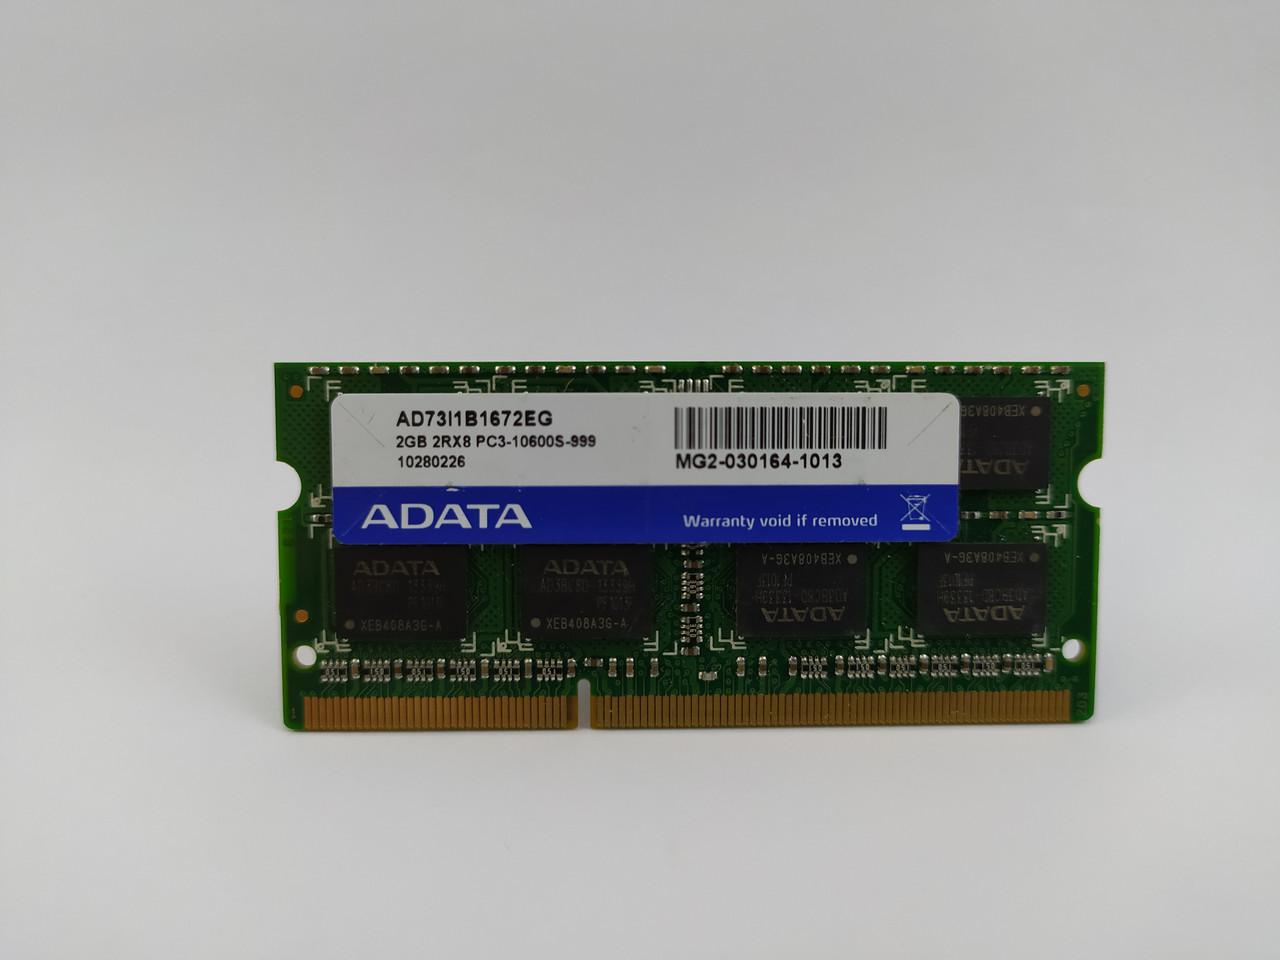 Оперативная память для ноутбука SODIMM ADATA DDR3 2Gb 1333MHz PC3-10600S (AD73I1B1672EG) Б/У